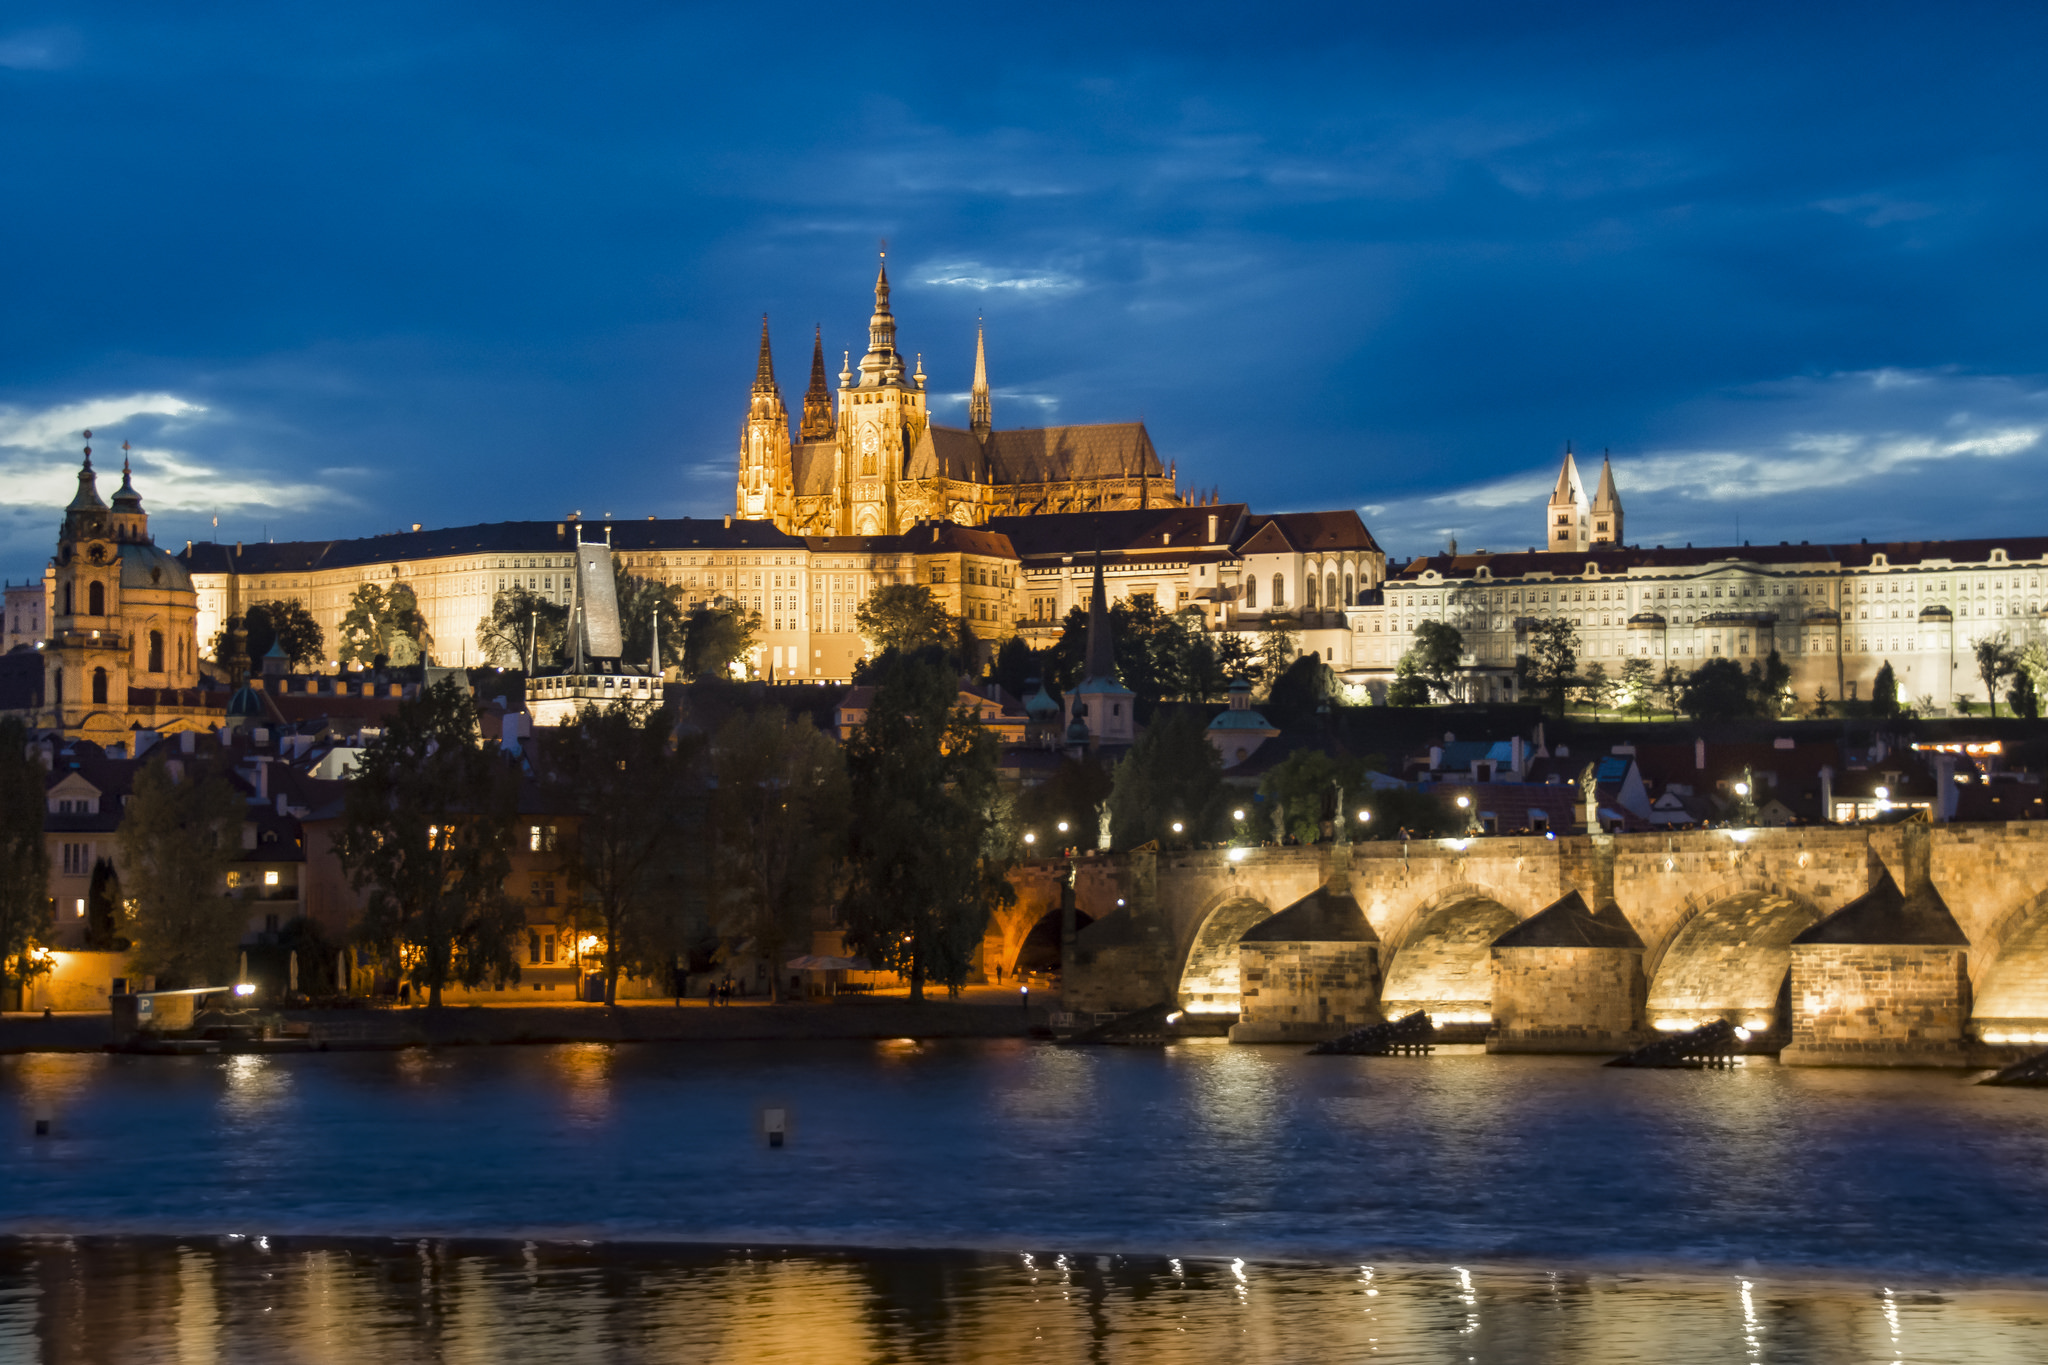 Prague Castle and St. Charles Bridge